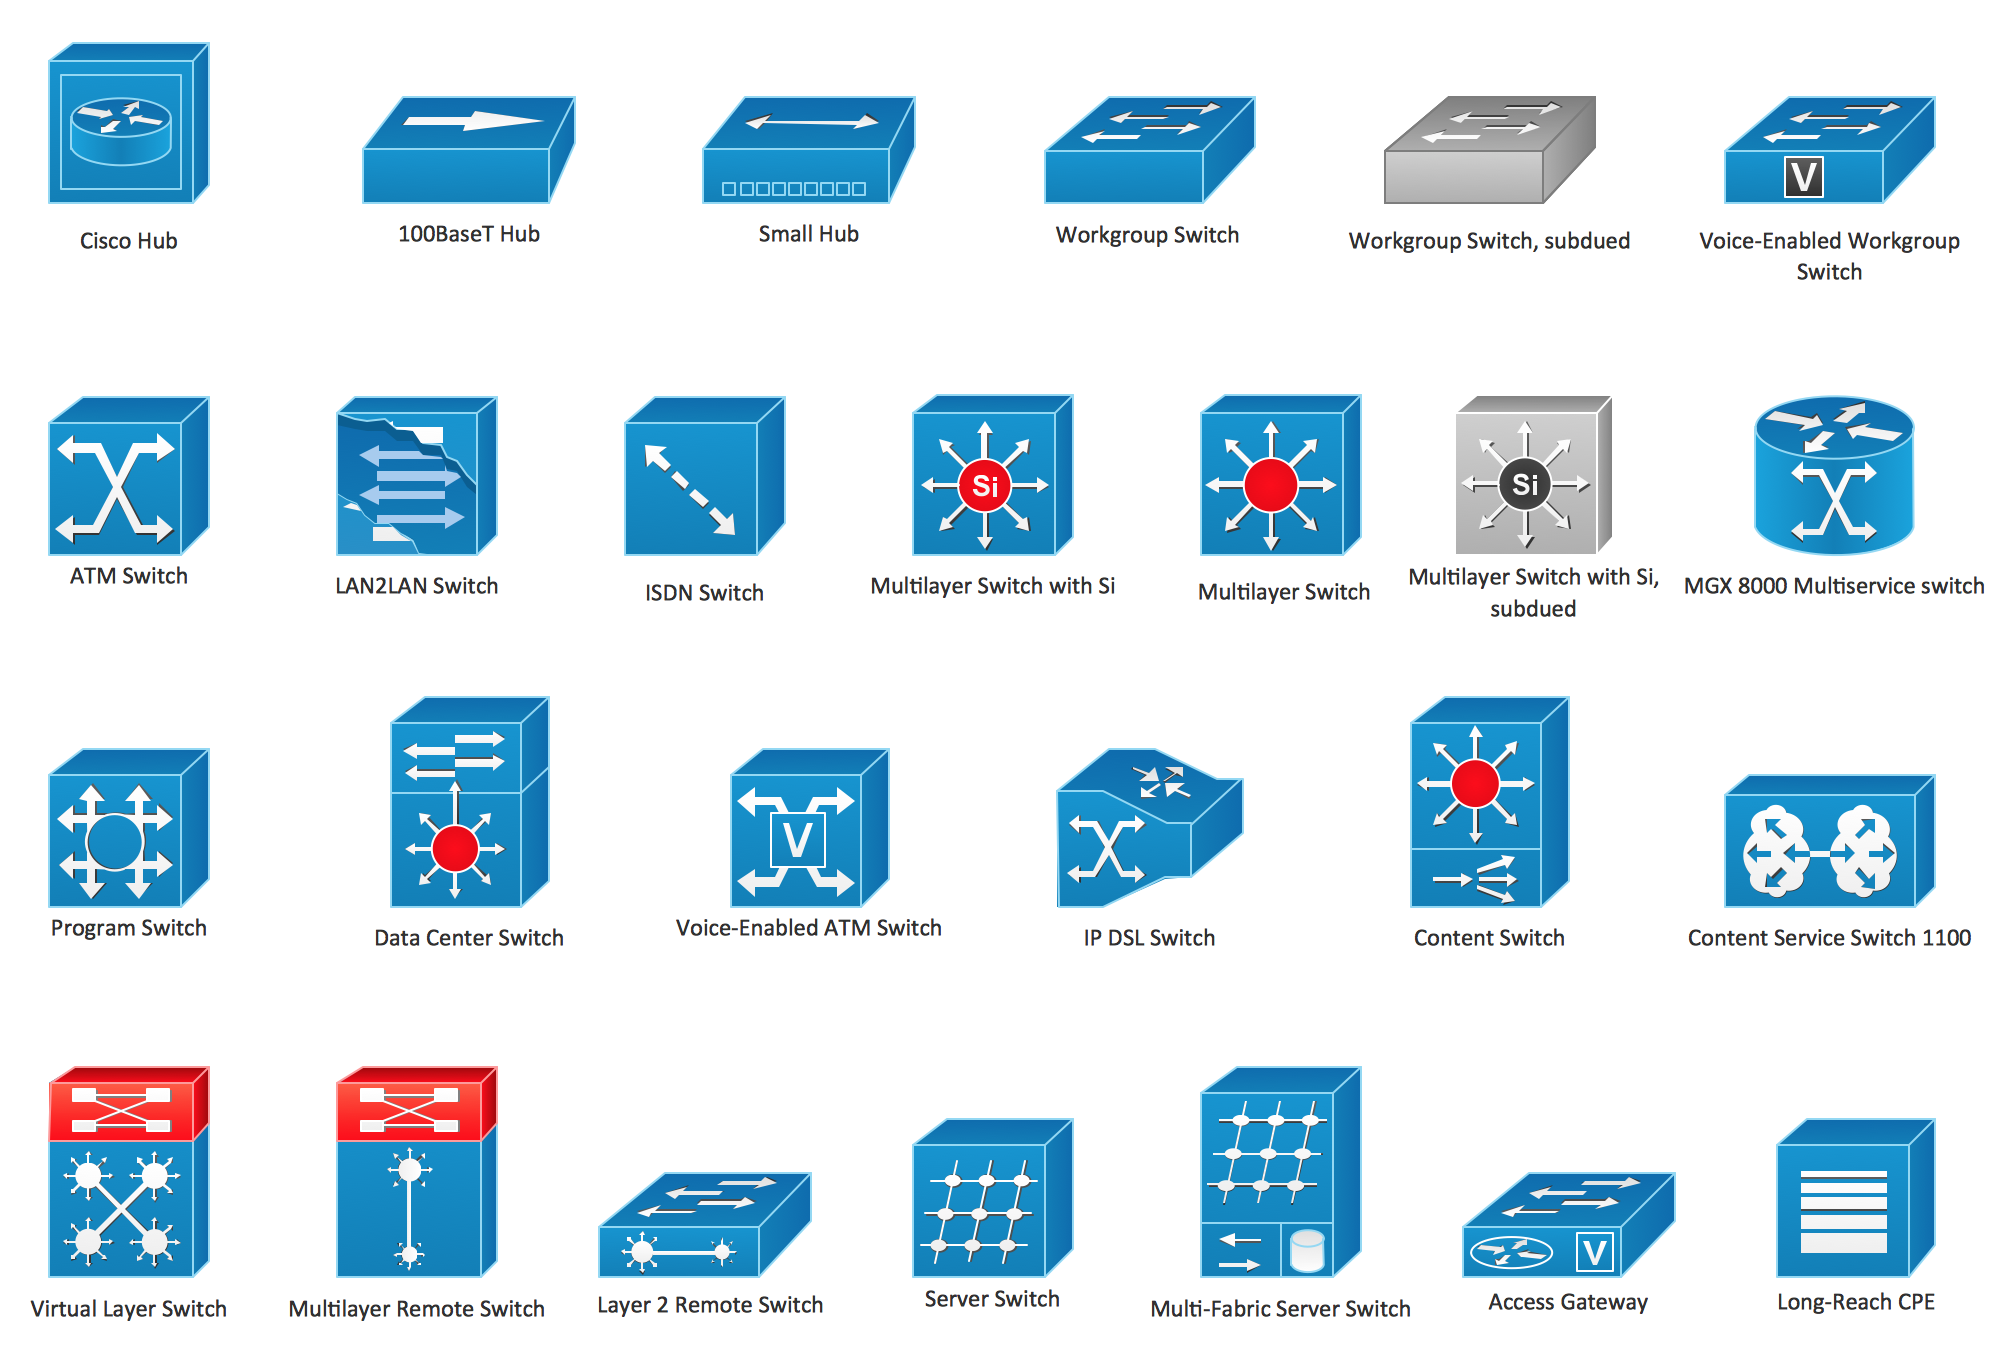 Network Symbols Clip Art : Cisco router symbol icons images network